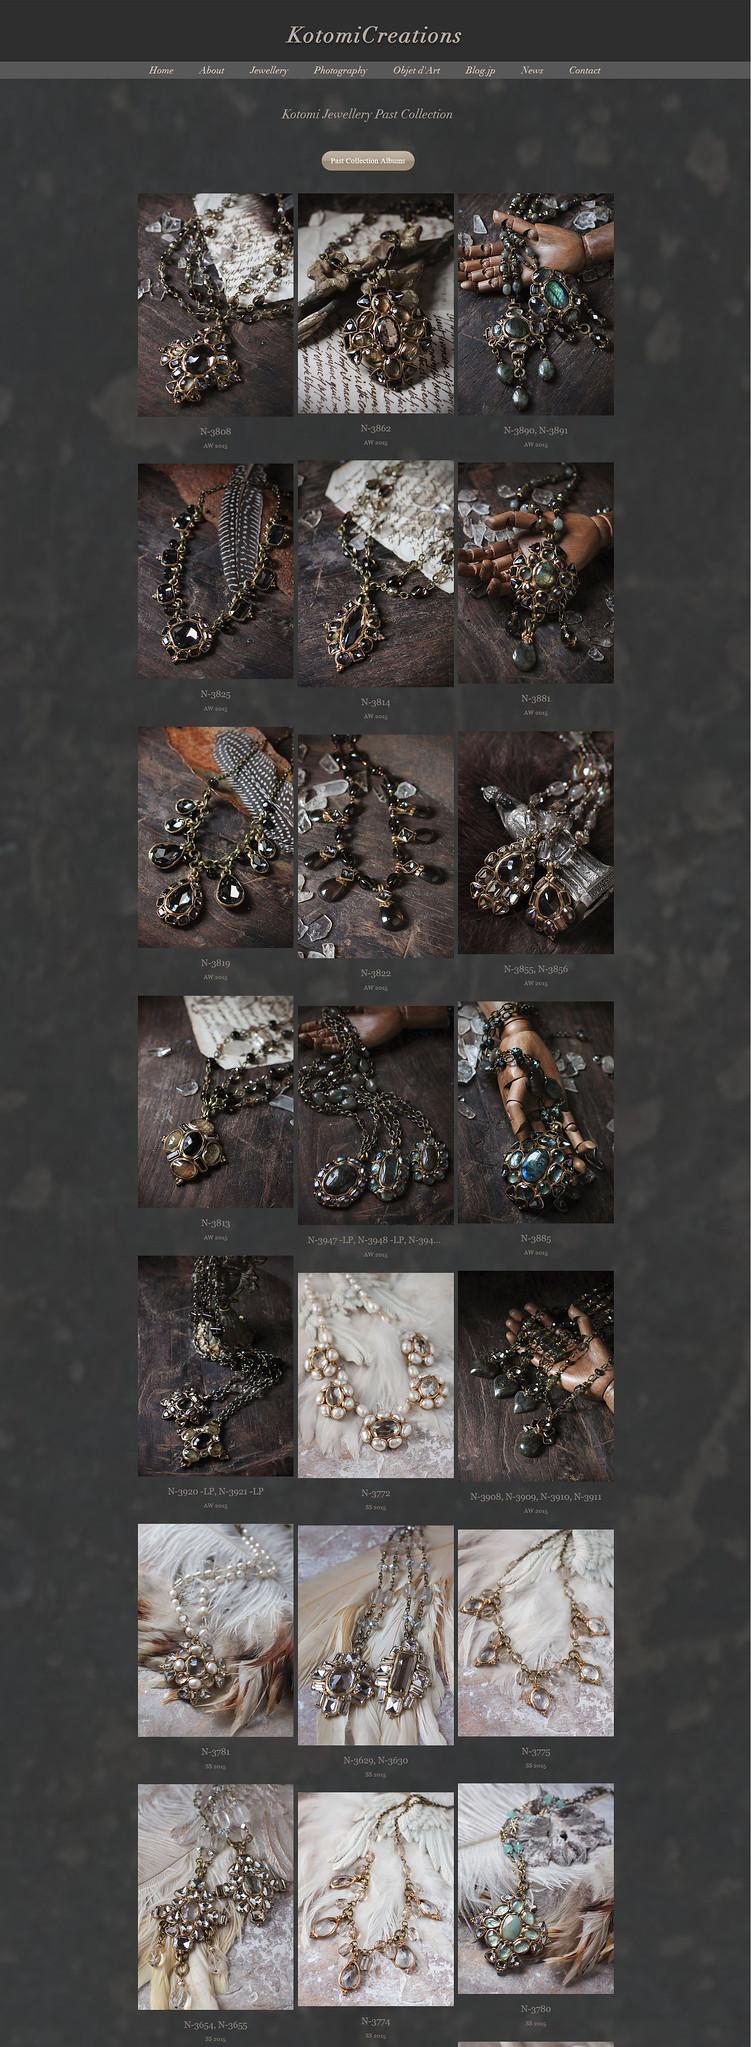 Jewellery-pastcollection-capture